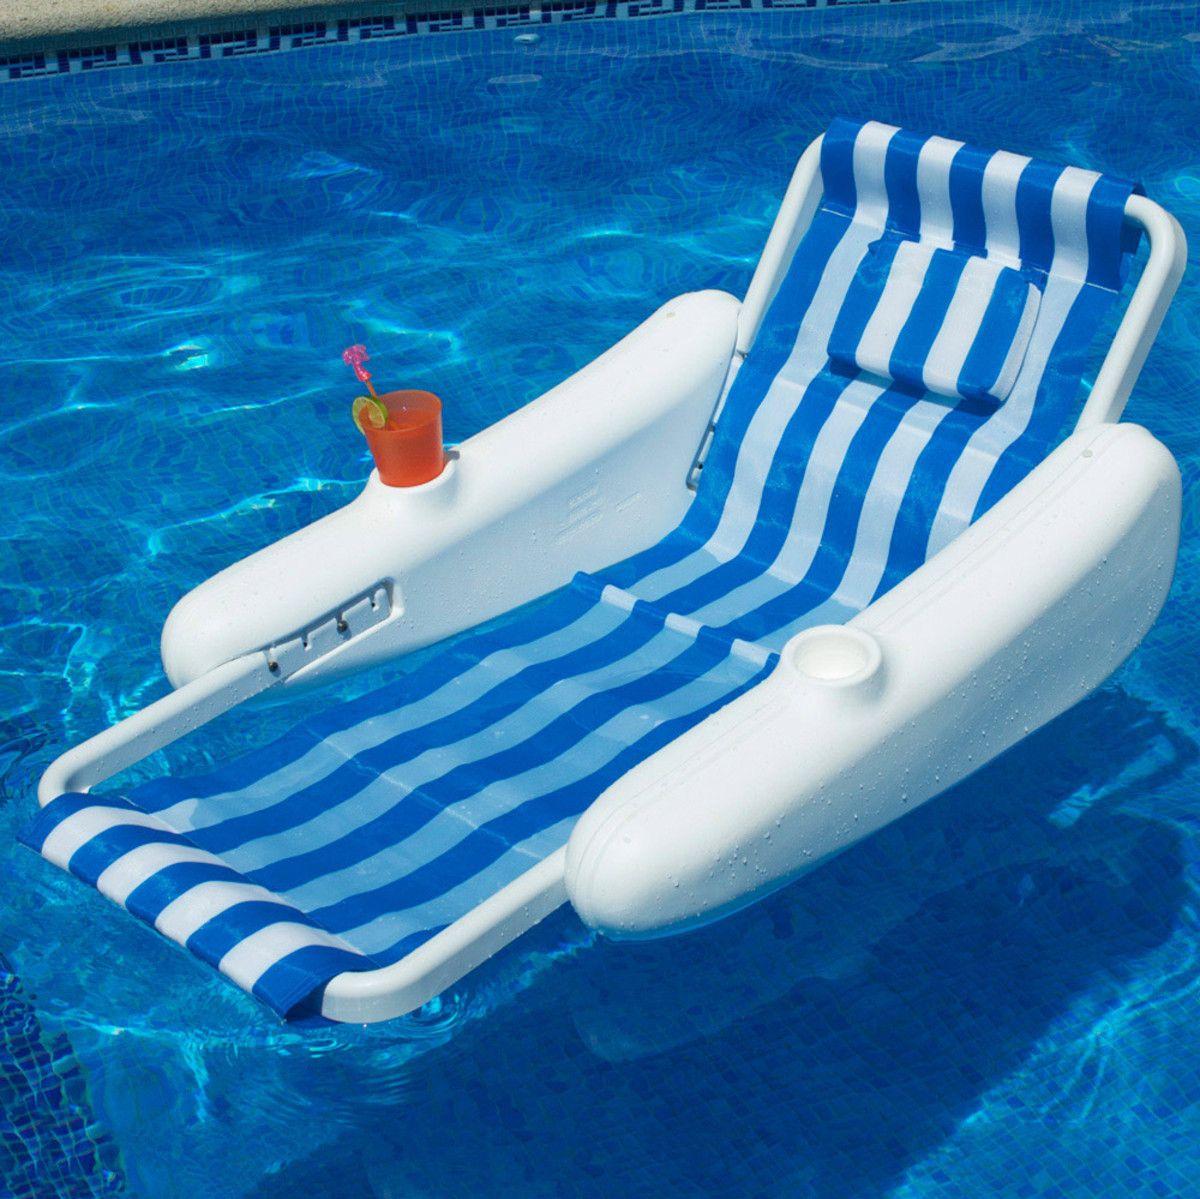 Swimline Sunchaser Sling Floating Lounge Floating Lounge Pool Floats Inflatable Pool Floats